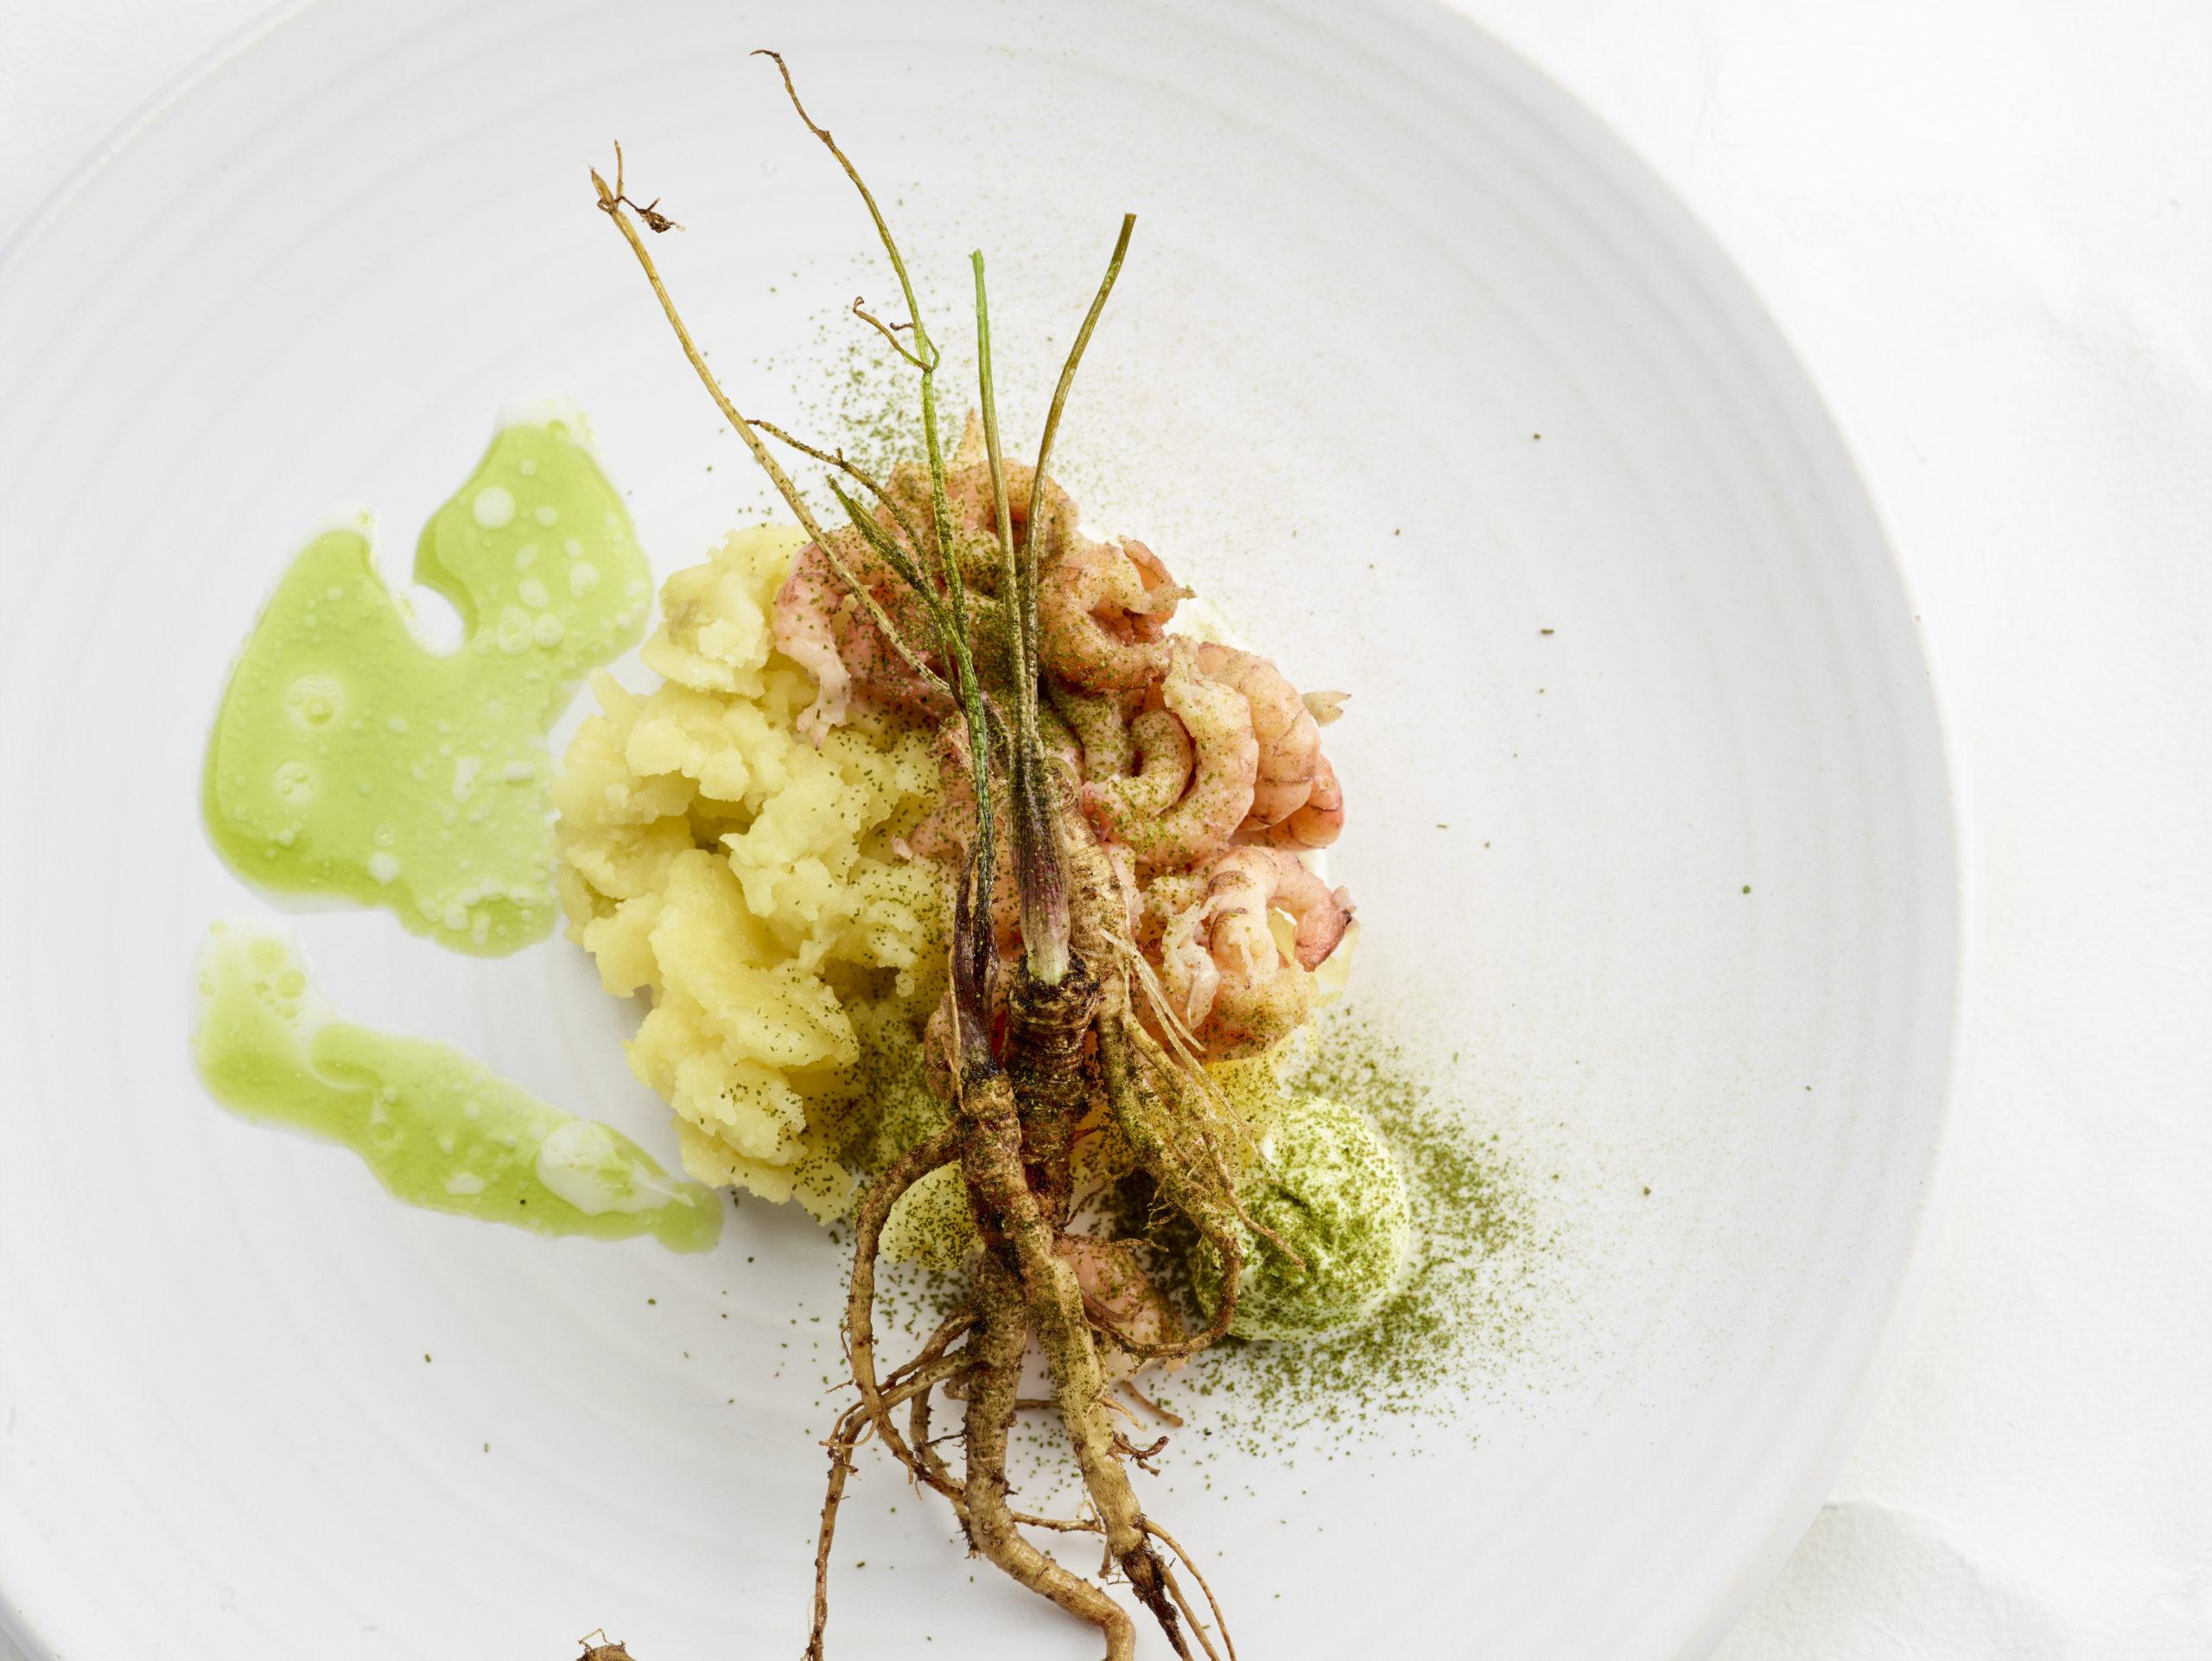 Handgepelde garnalen met geplette aardappel, lavas en karnemelk - Culinaire Ambiance